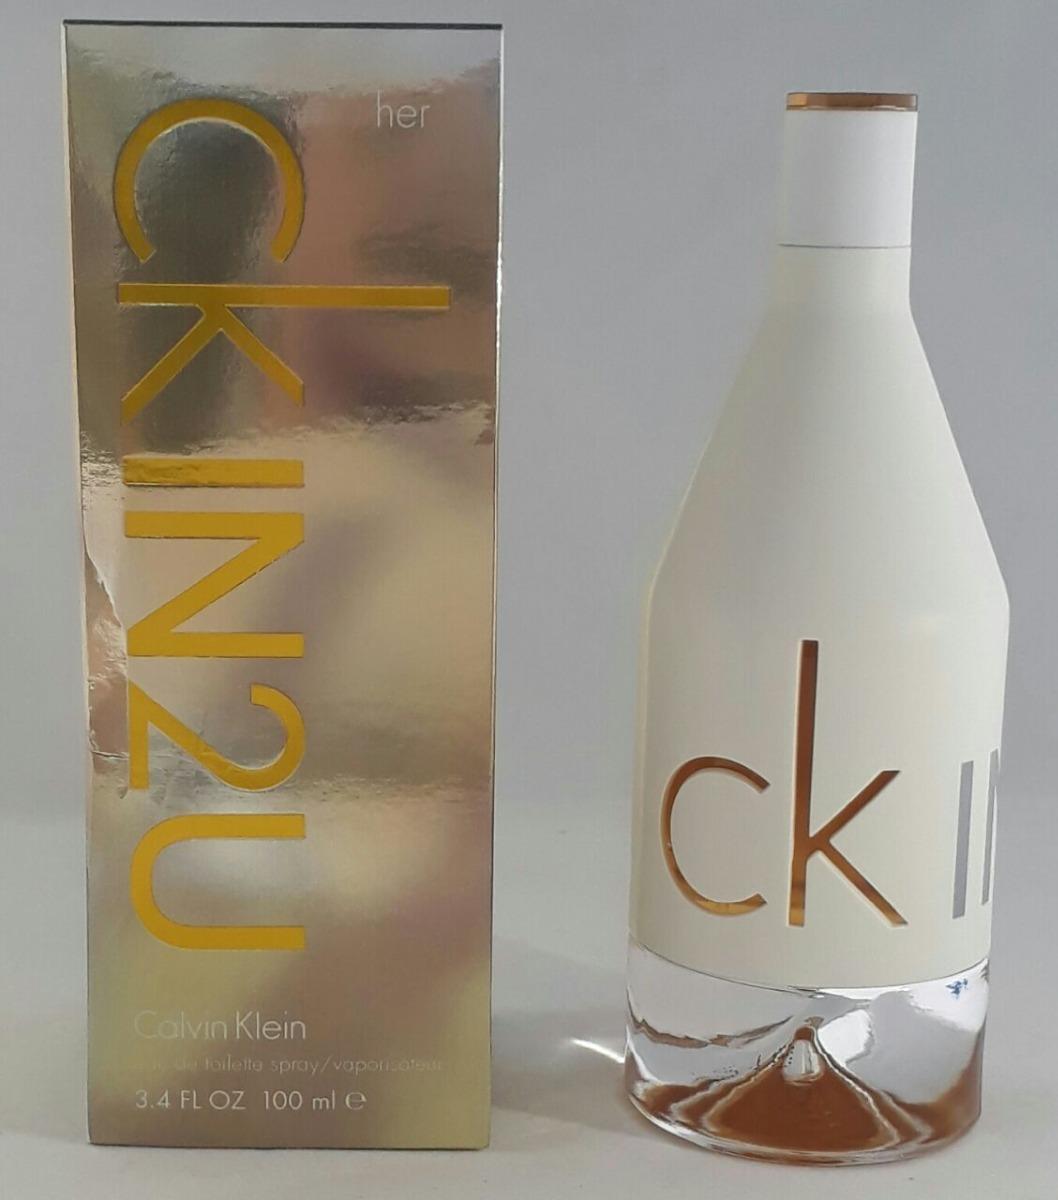 b257f13a8da30 Perfume Ckin2u 100ml Calvin Klein Fem Edt + Brinde Amostra - R  165 ...